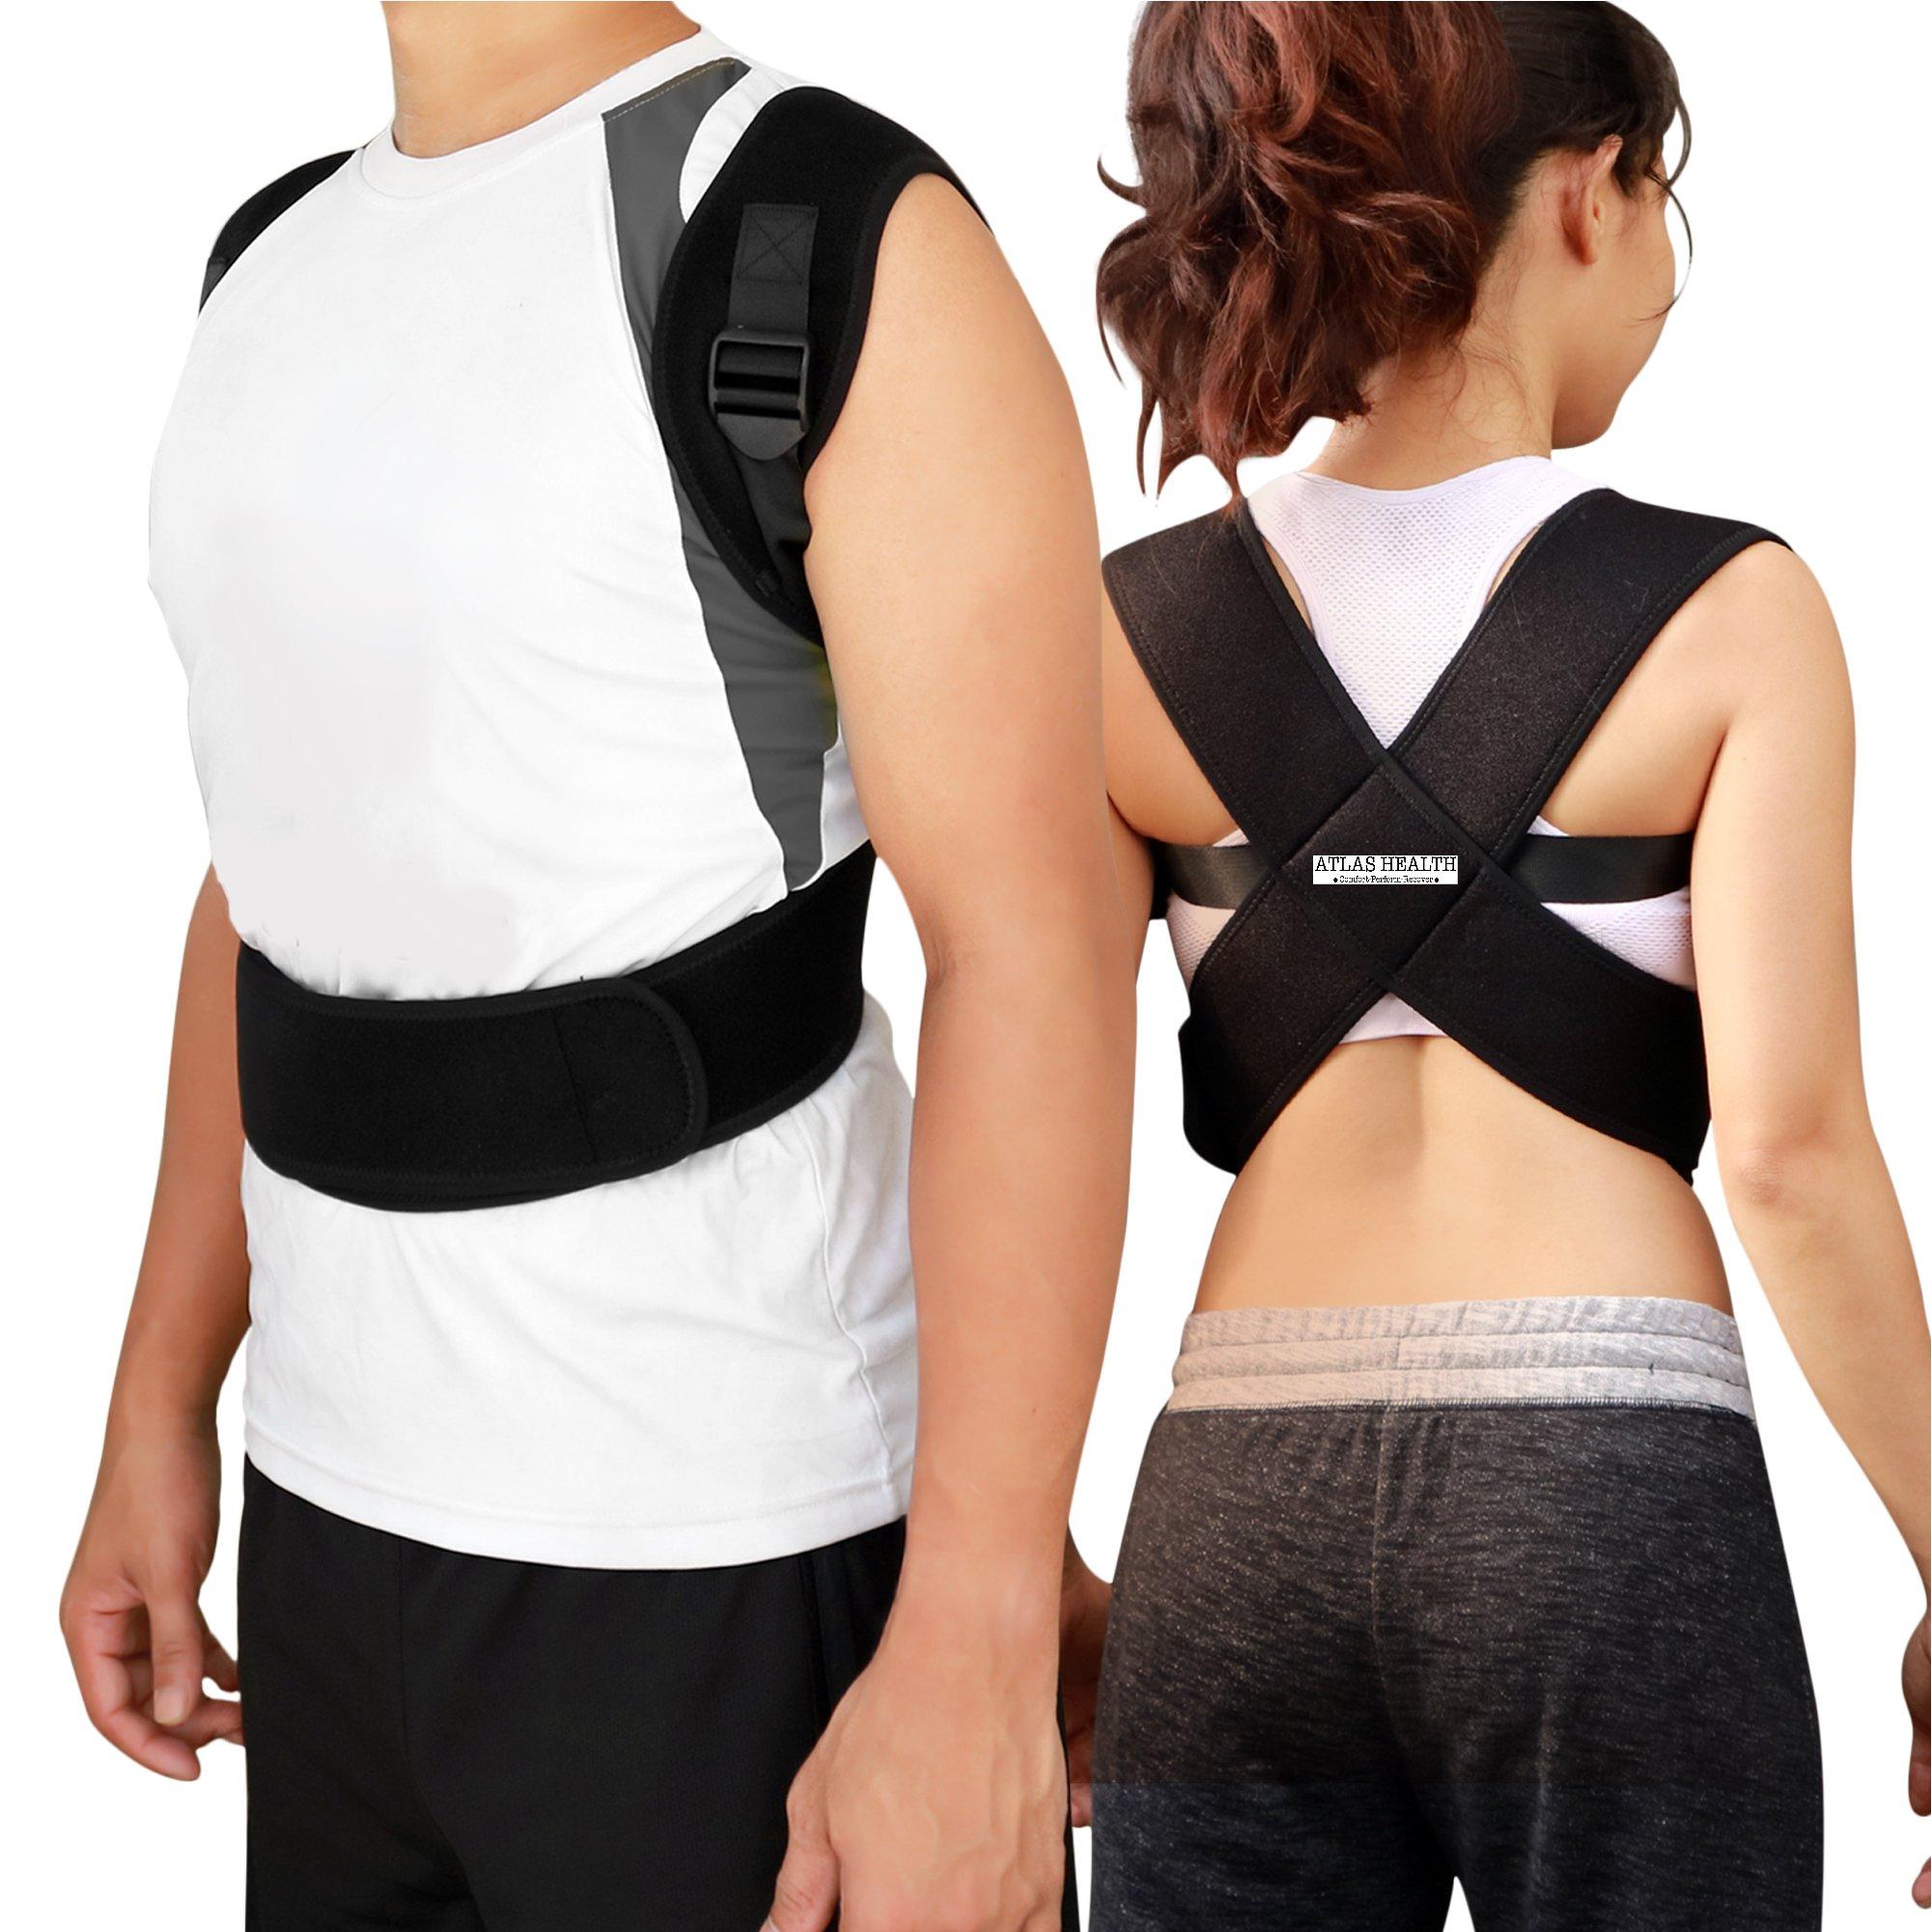 Atlas Health Ultimate Posture Corrector & Resistance Band Set For Men & Women - Align Your Spine & Relieve Back Pain - Soft, Lightweight, Breathable Neoprene for Comfort - Discreet Adjustable Design